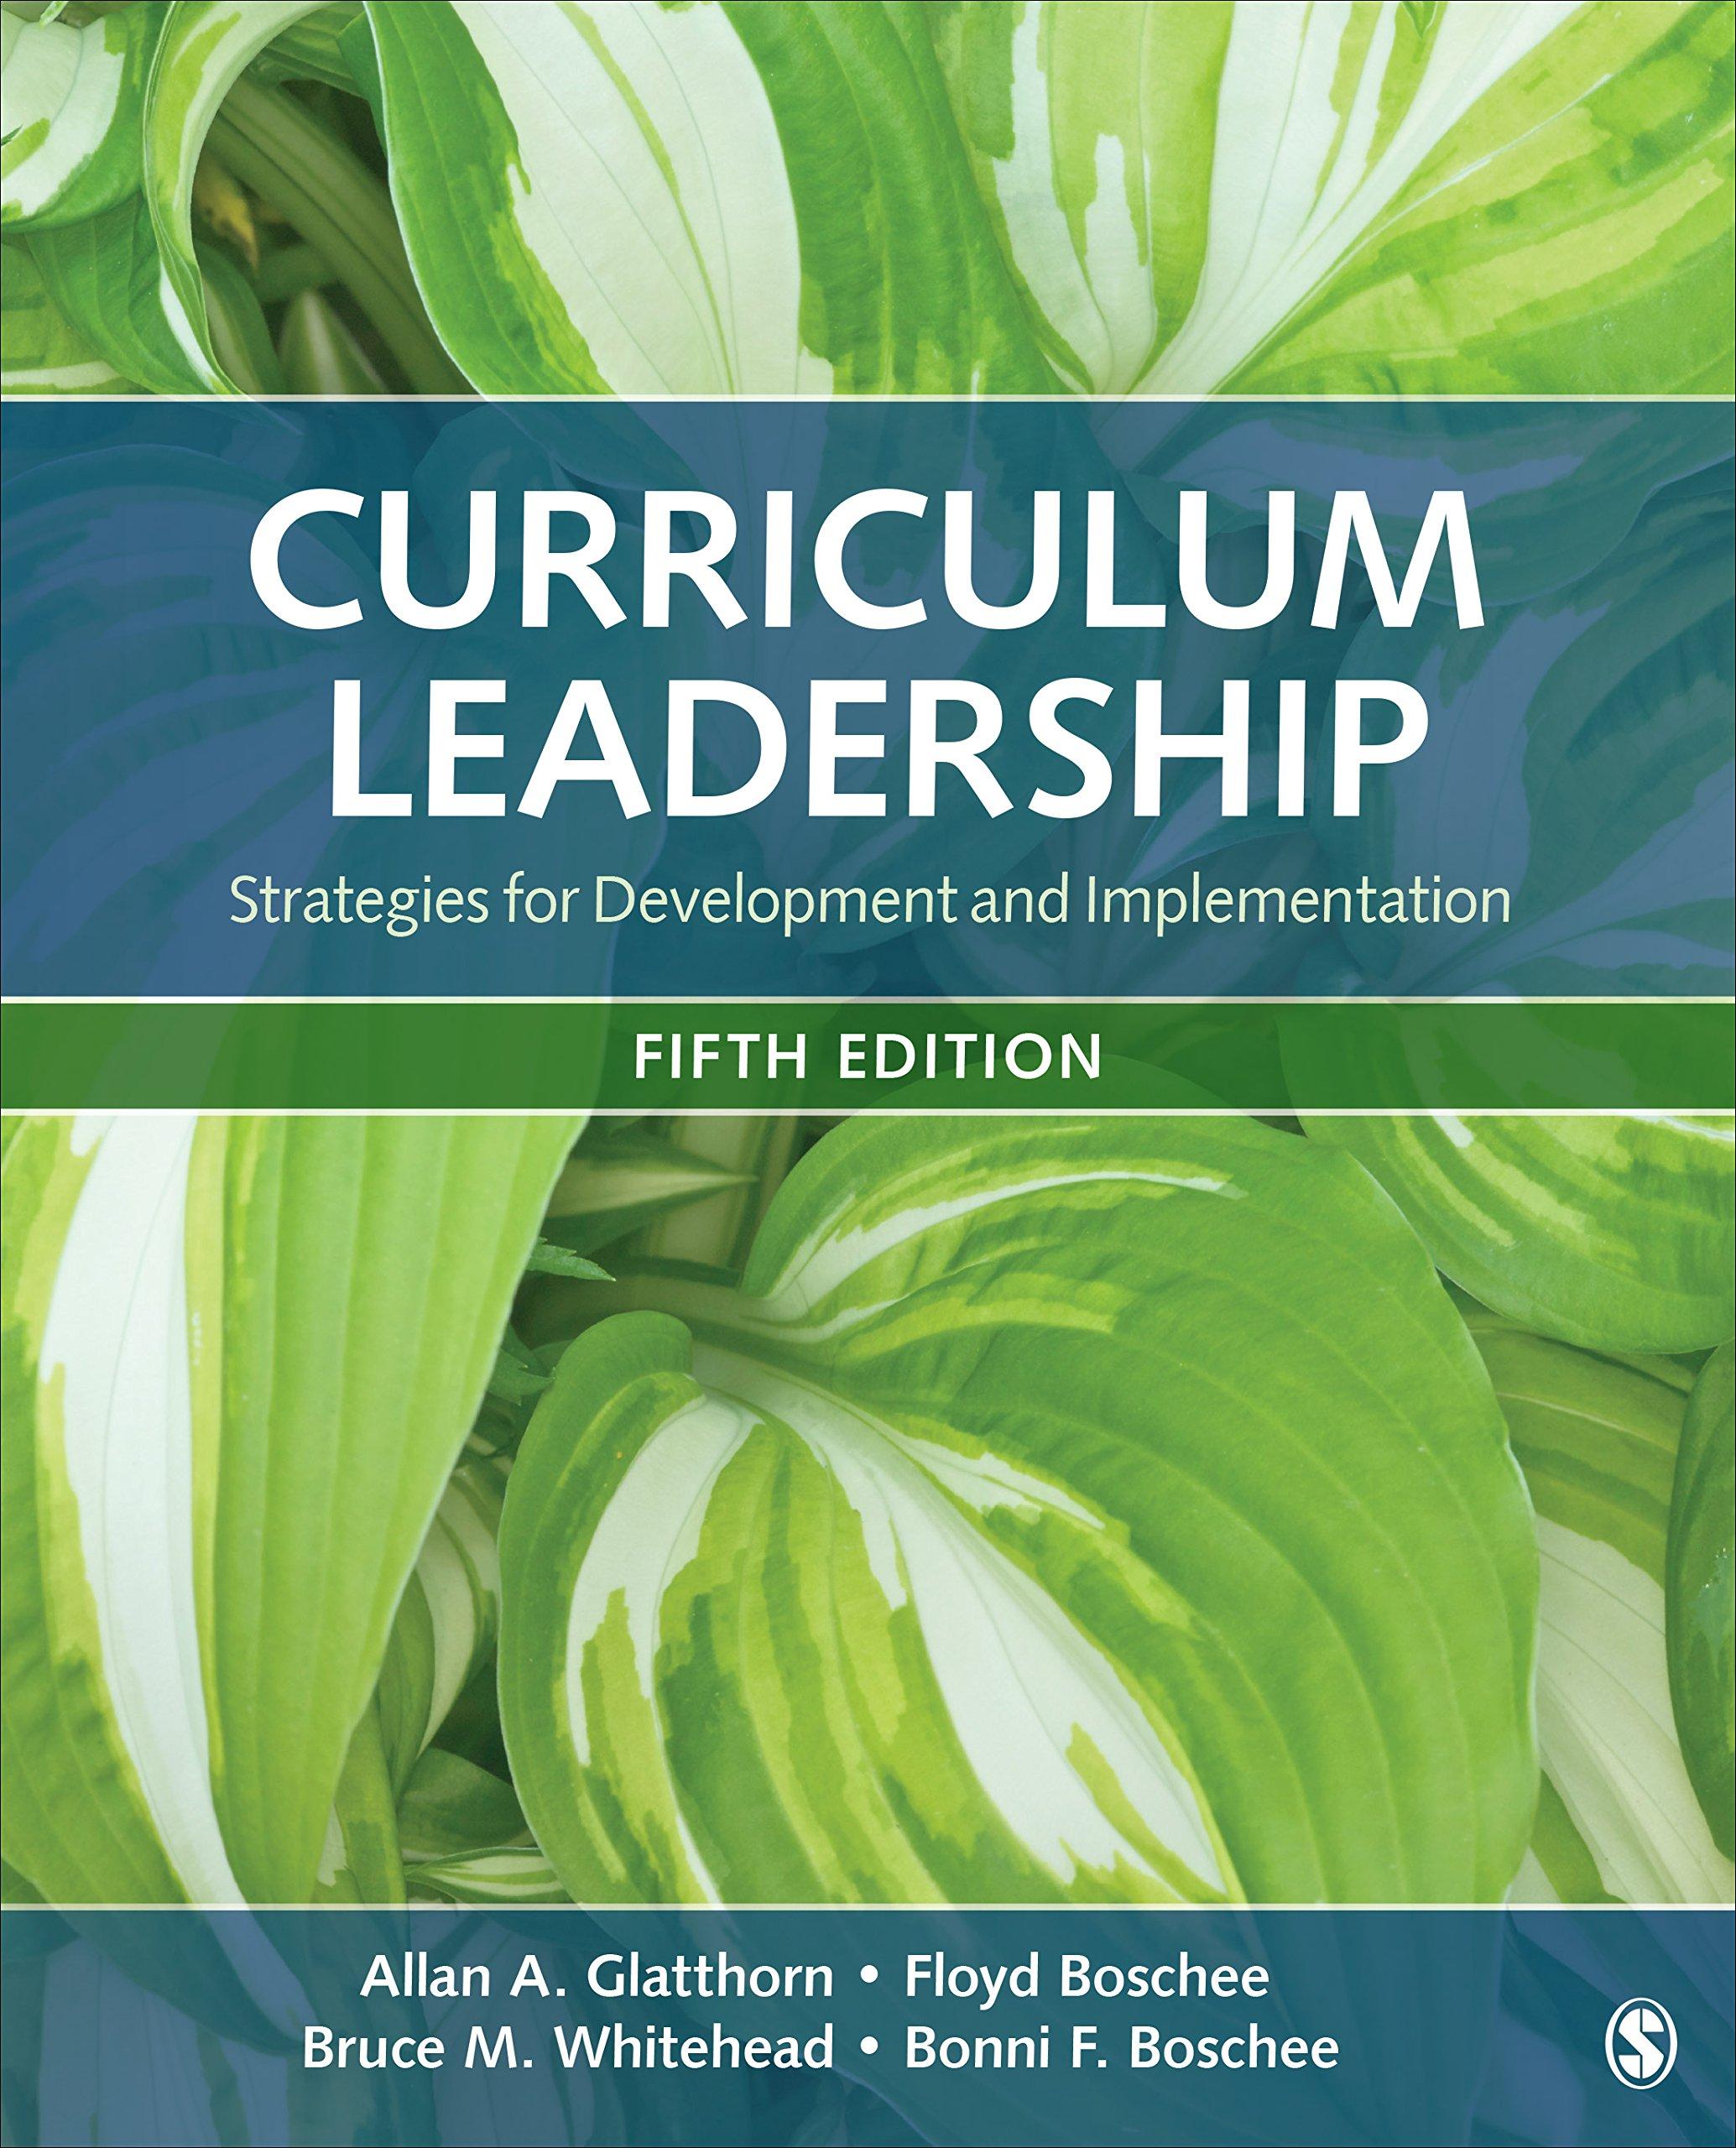 Curriculum Leadership: Strategies for Development and Implementation: Allan  A. Glatthorn, Floyd A. Boschee, Bruce M. Whitehead, Bonni F. Boschee: ...